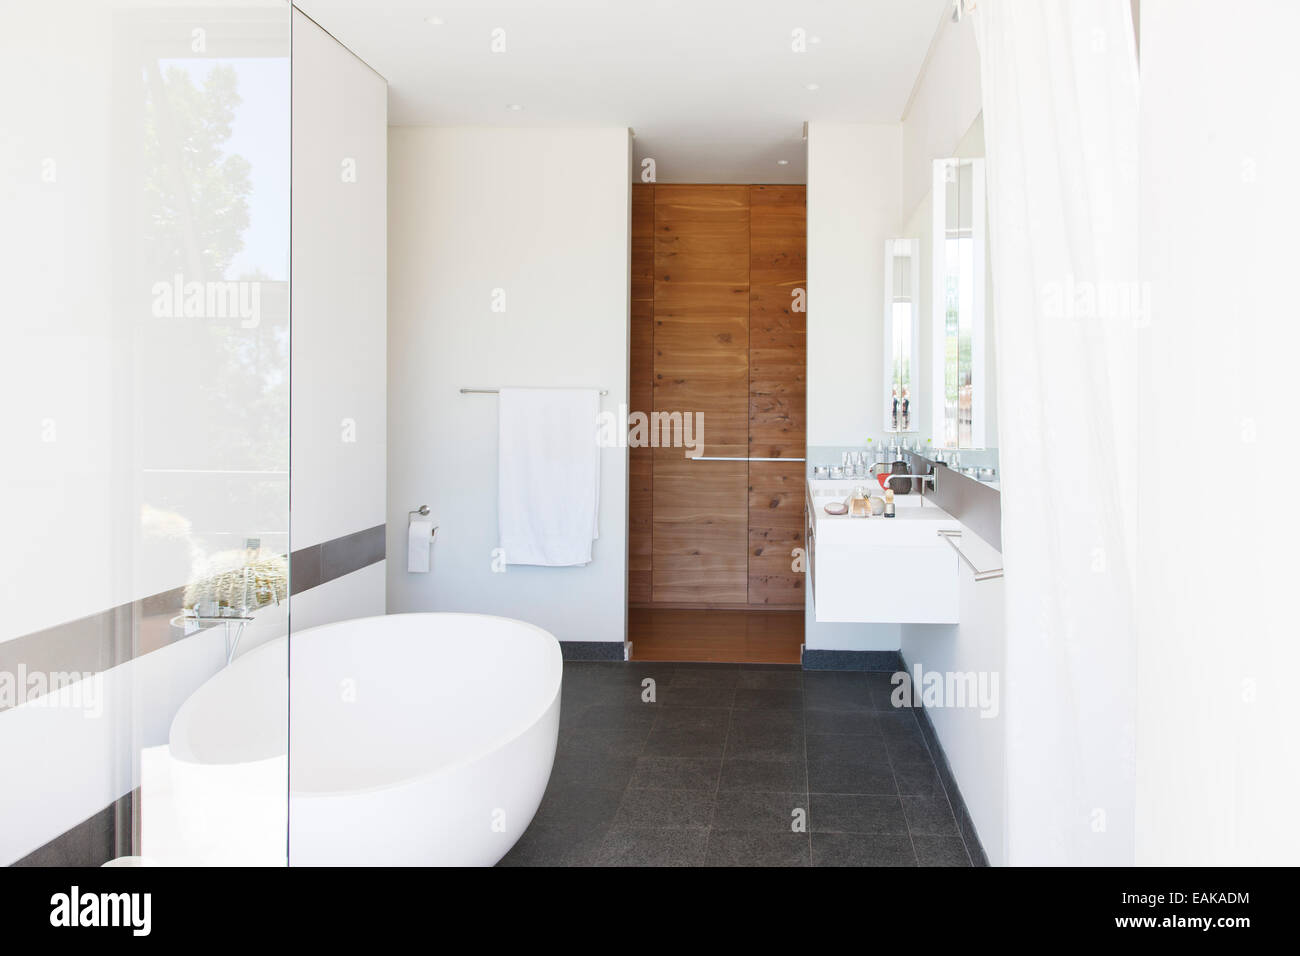 Modern Bathroom Interior With Large Bathtub And Wooden Door